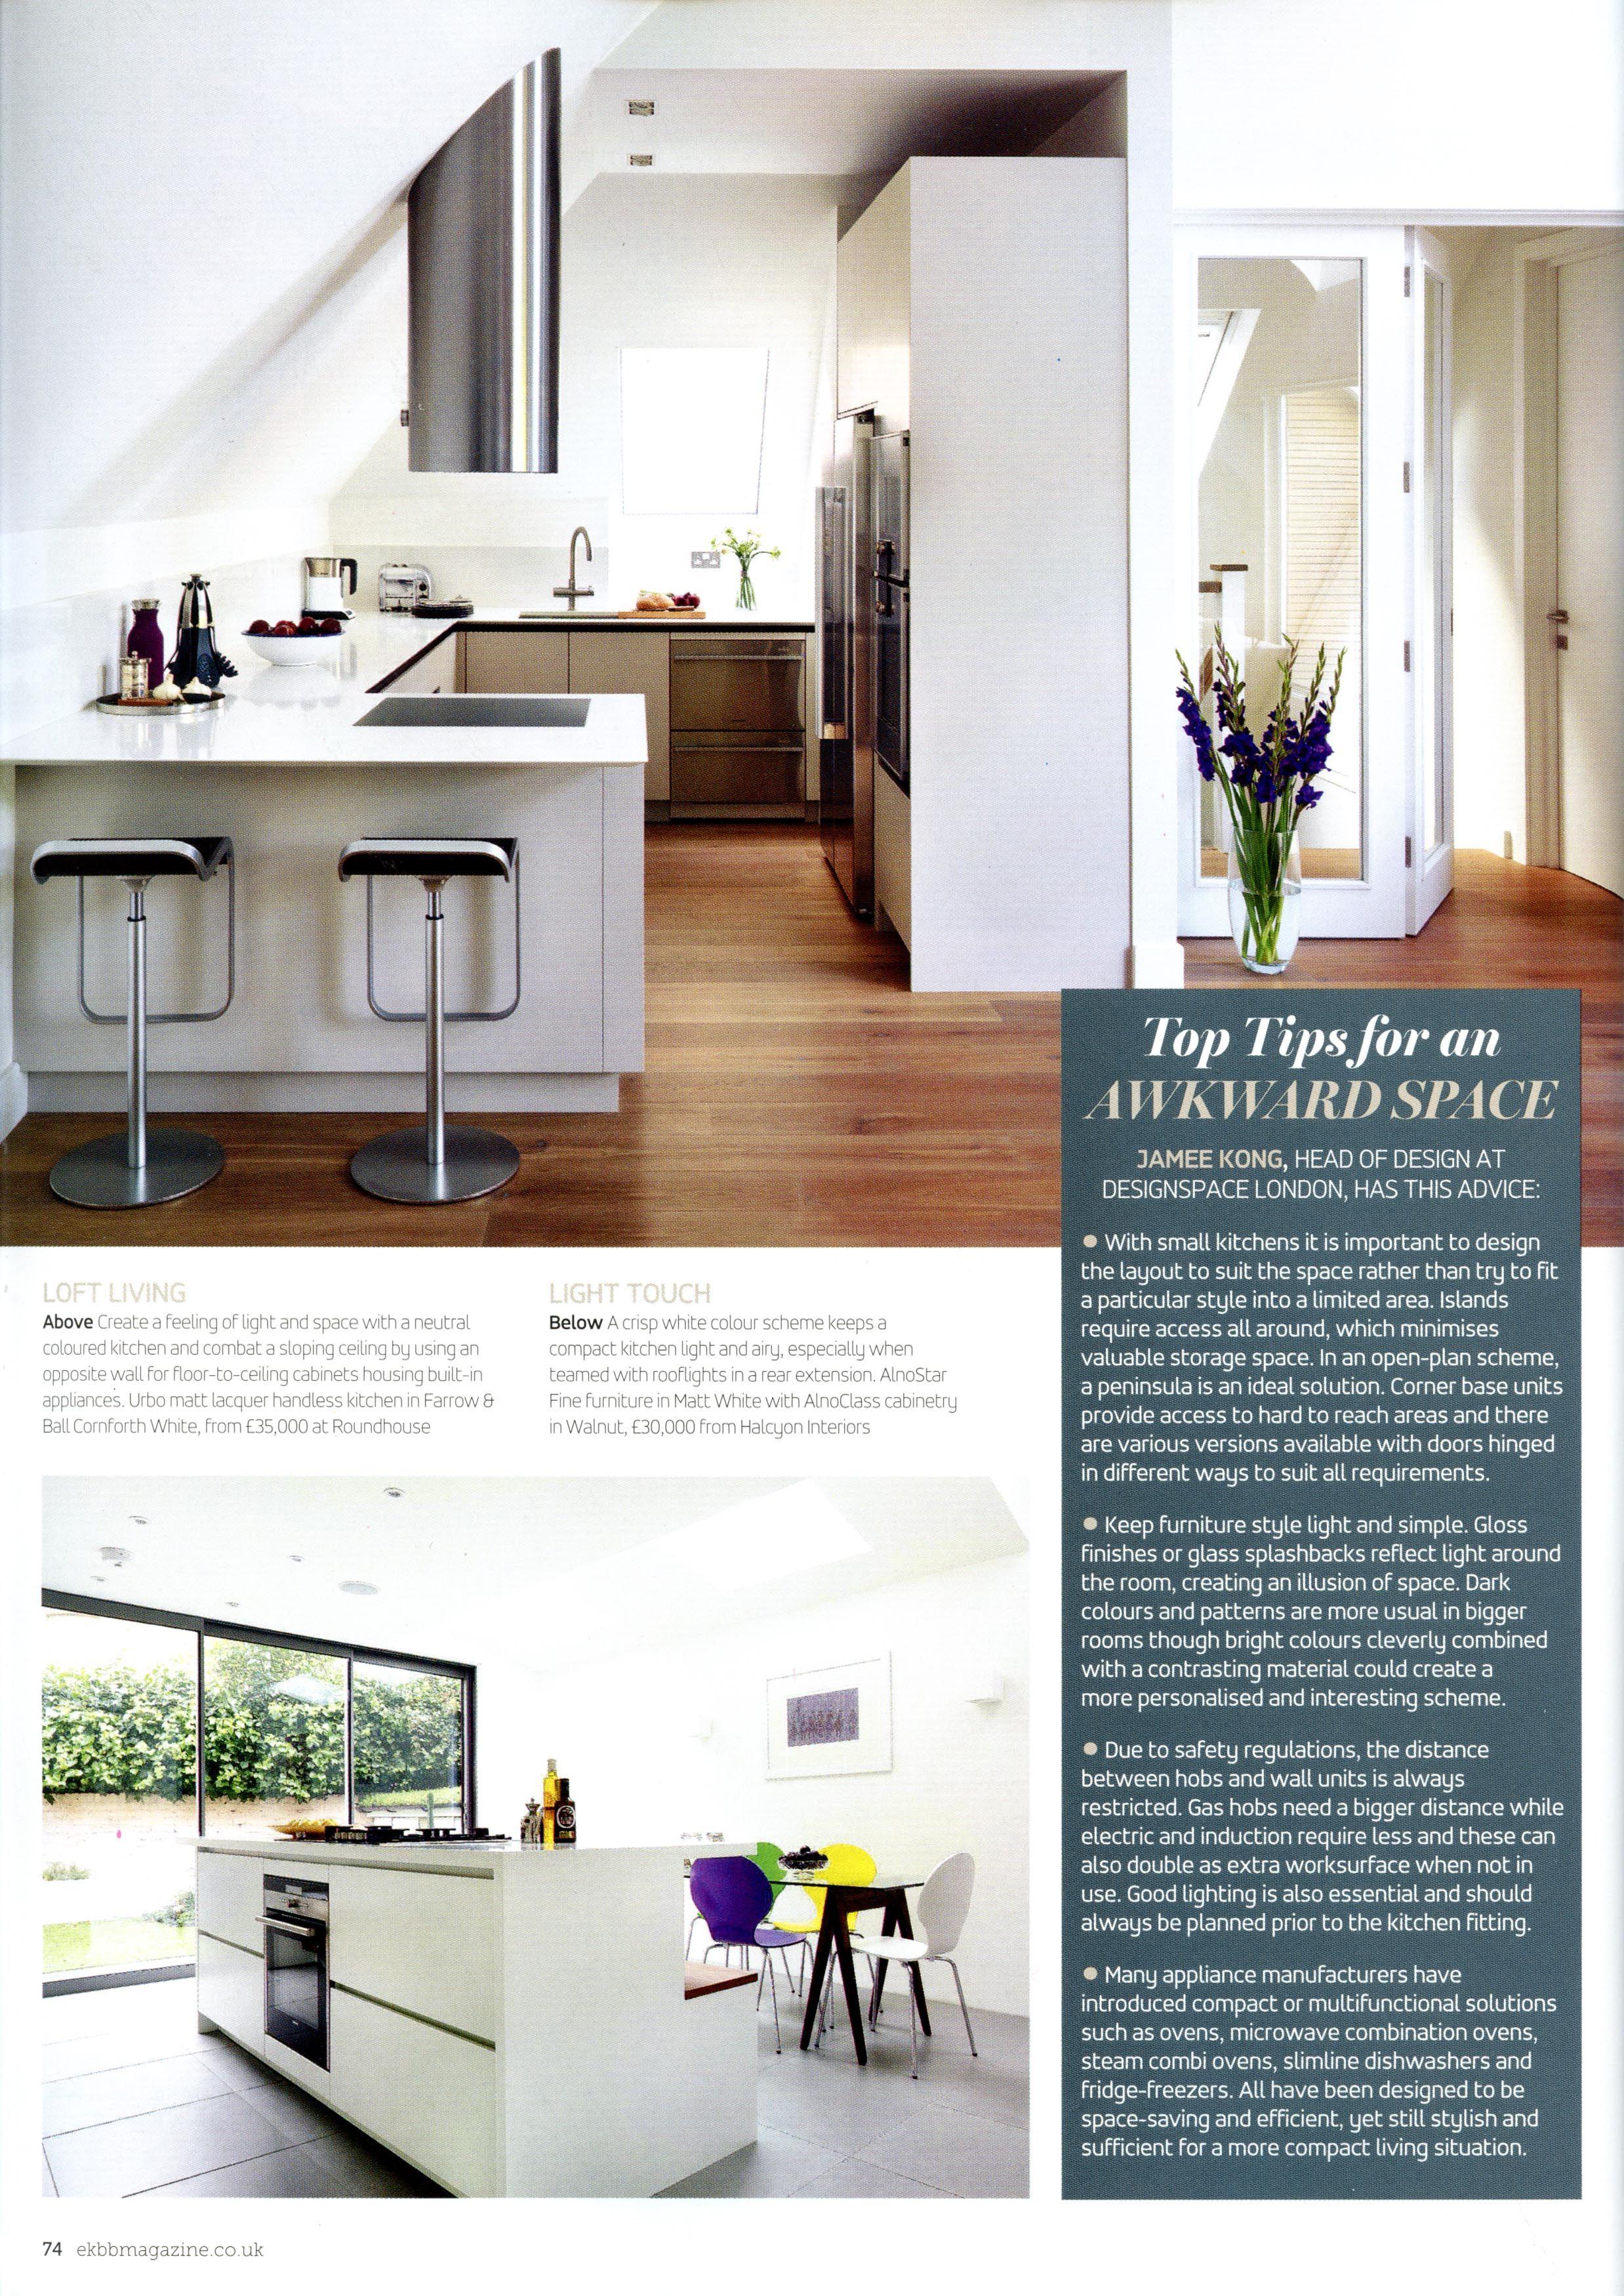 Loft bedroom regulations  Modulnovaus Studio concept in a laquered satin black finish